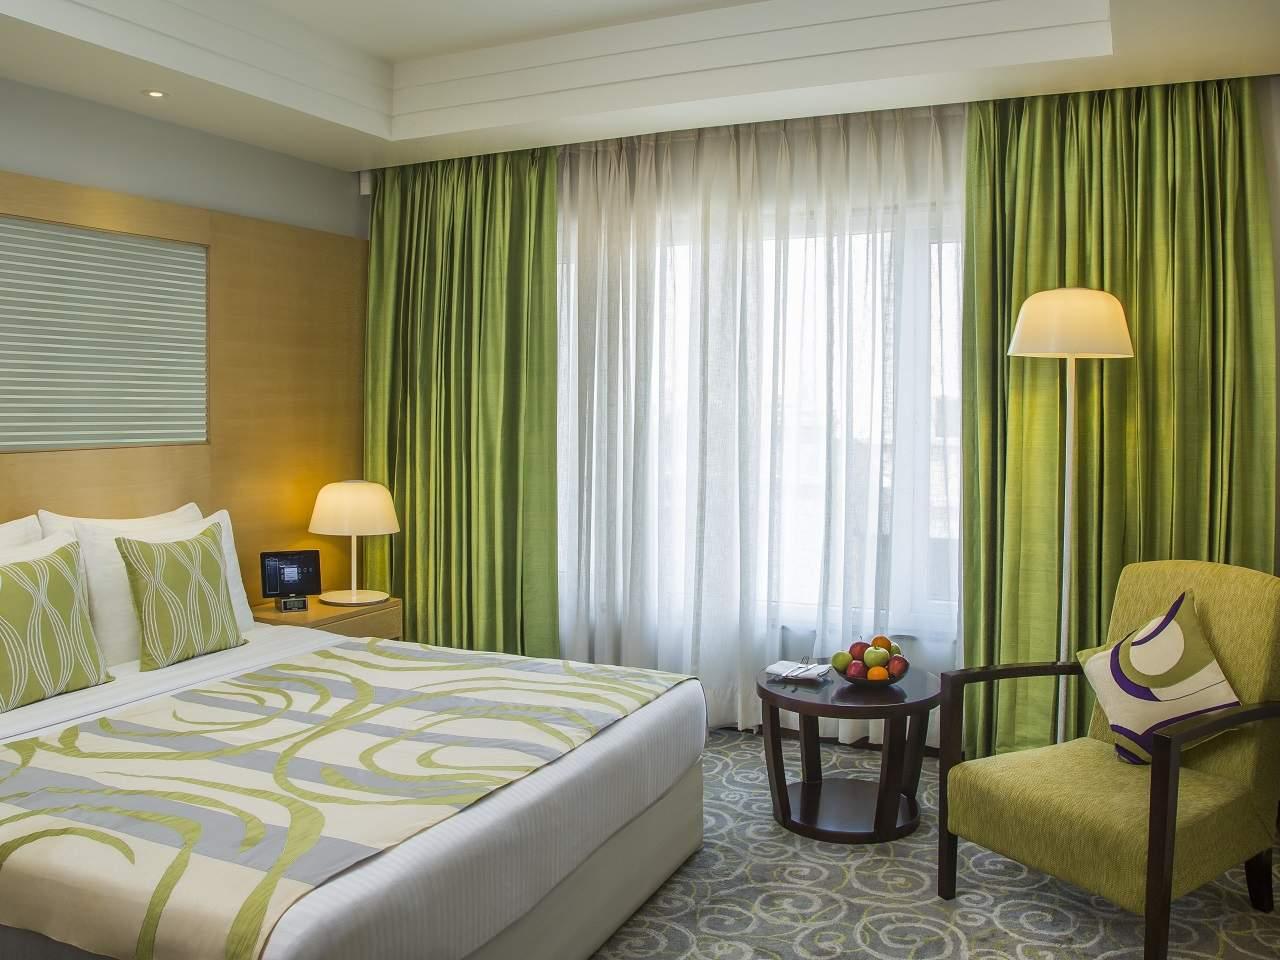 rooms-8_1280x960.jpg